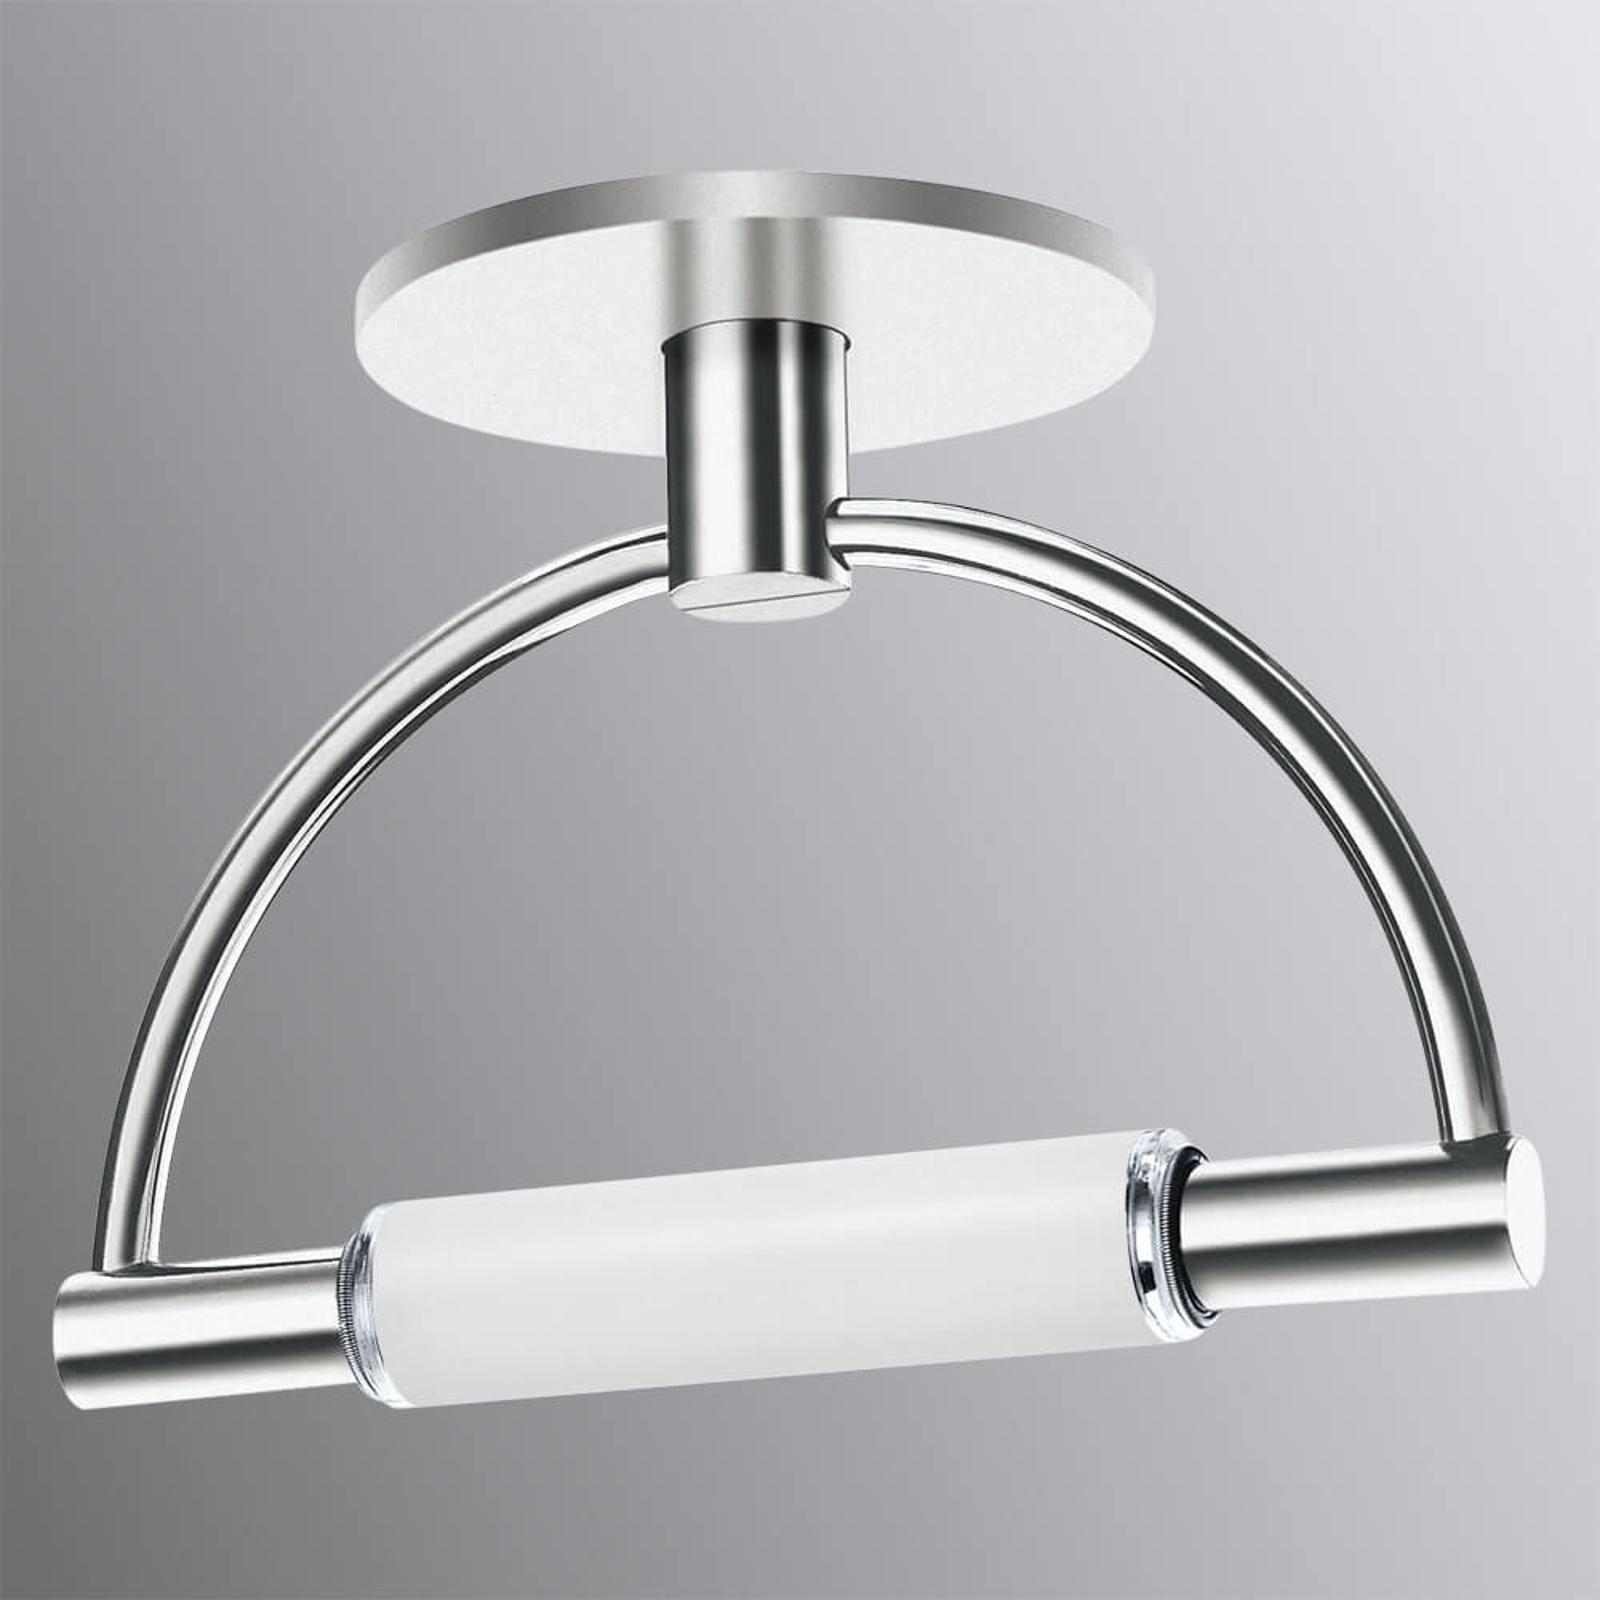 Cini&Nils Gradi - LED-Deckenlampe, blendfrei